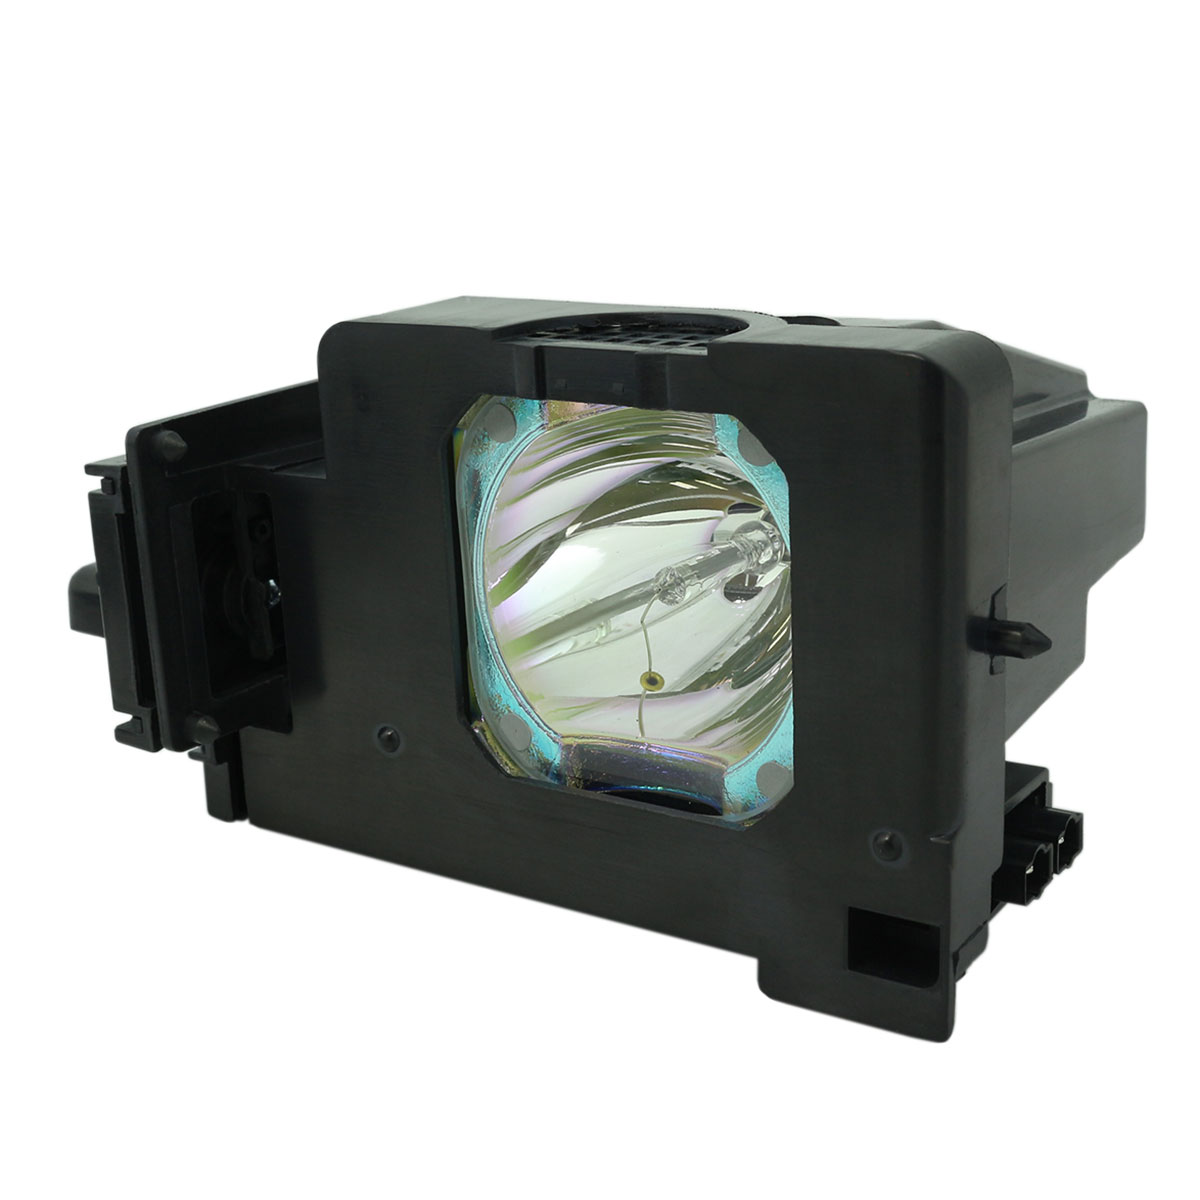 Panasonic TY-LA2006 TV Lamp